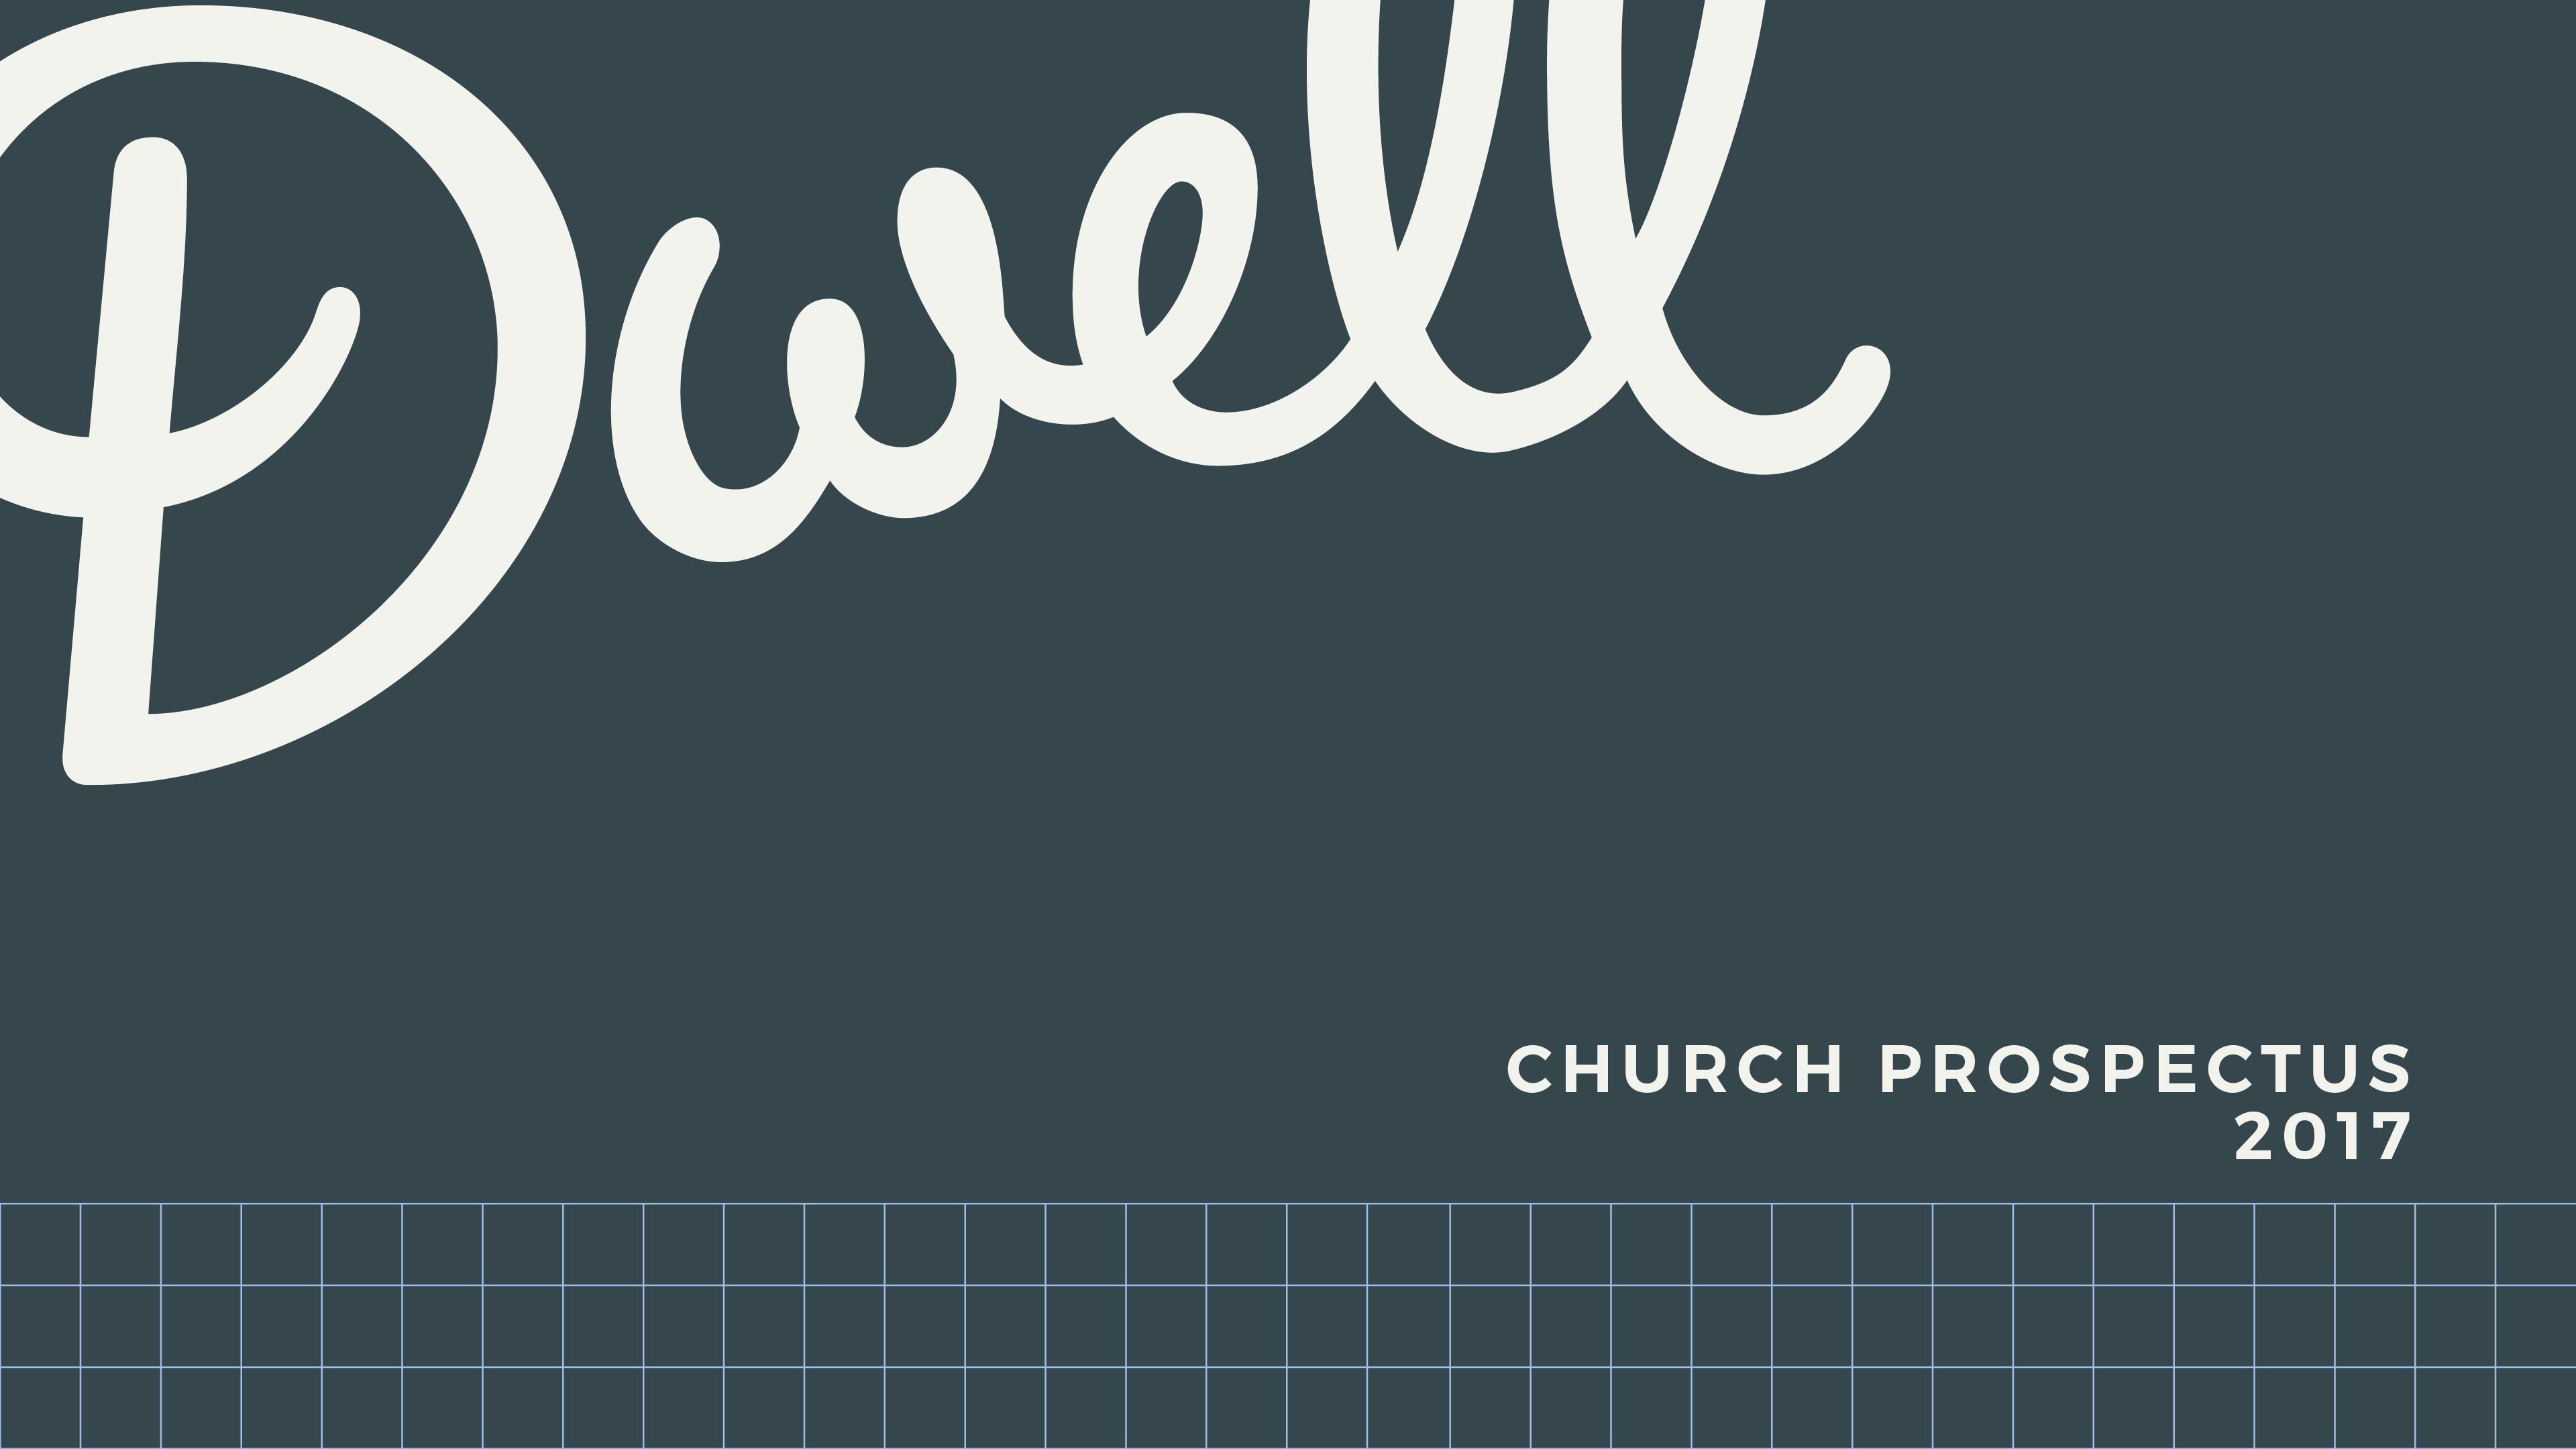 Dwell Church Prospectus